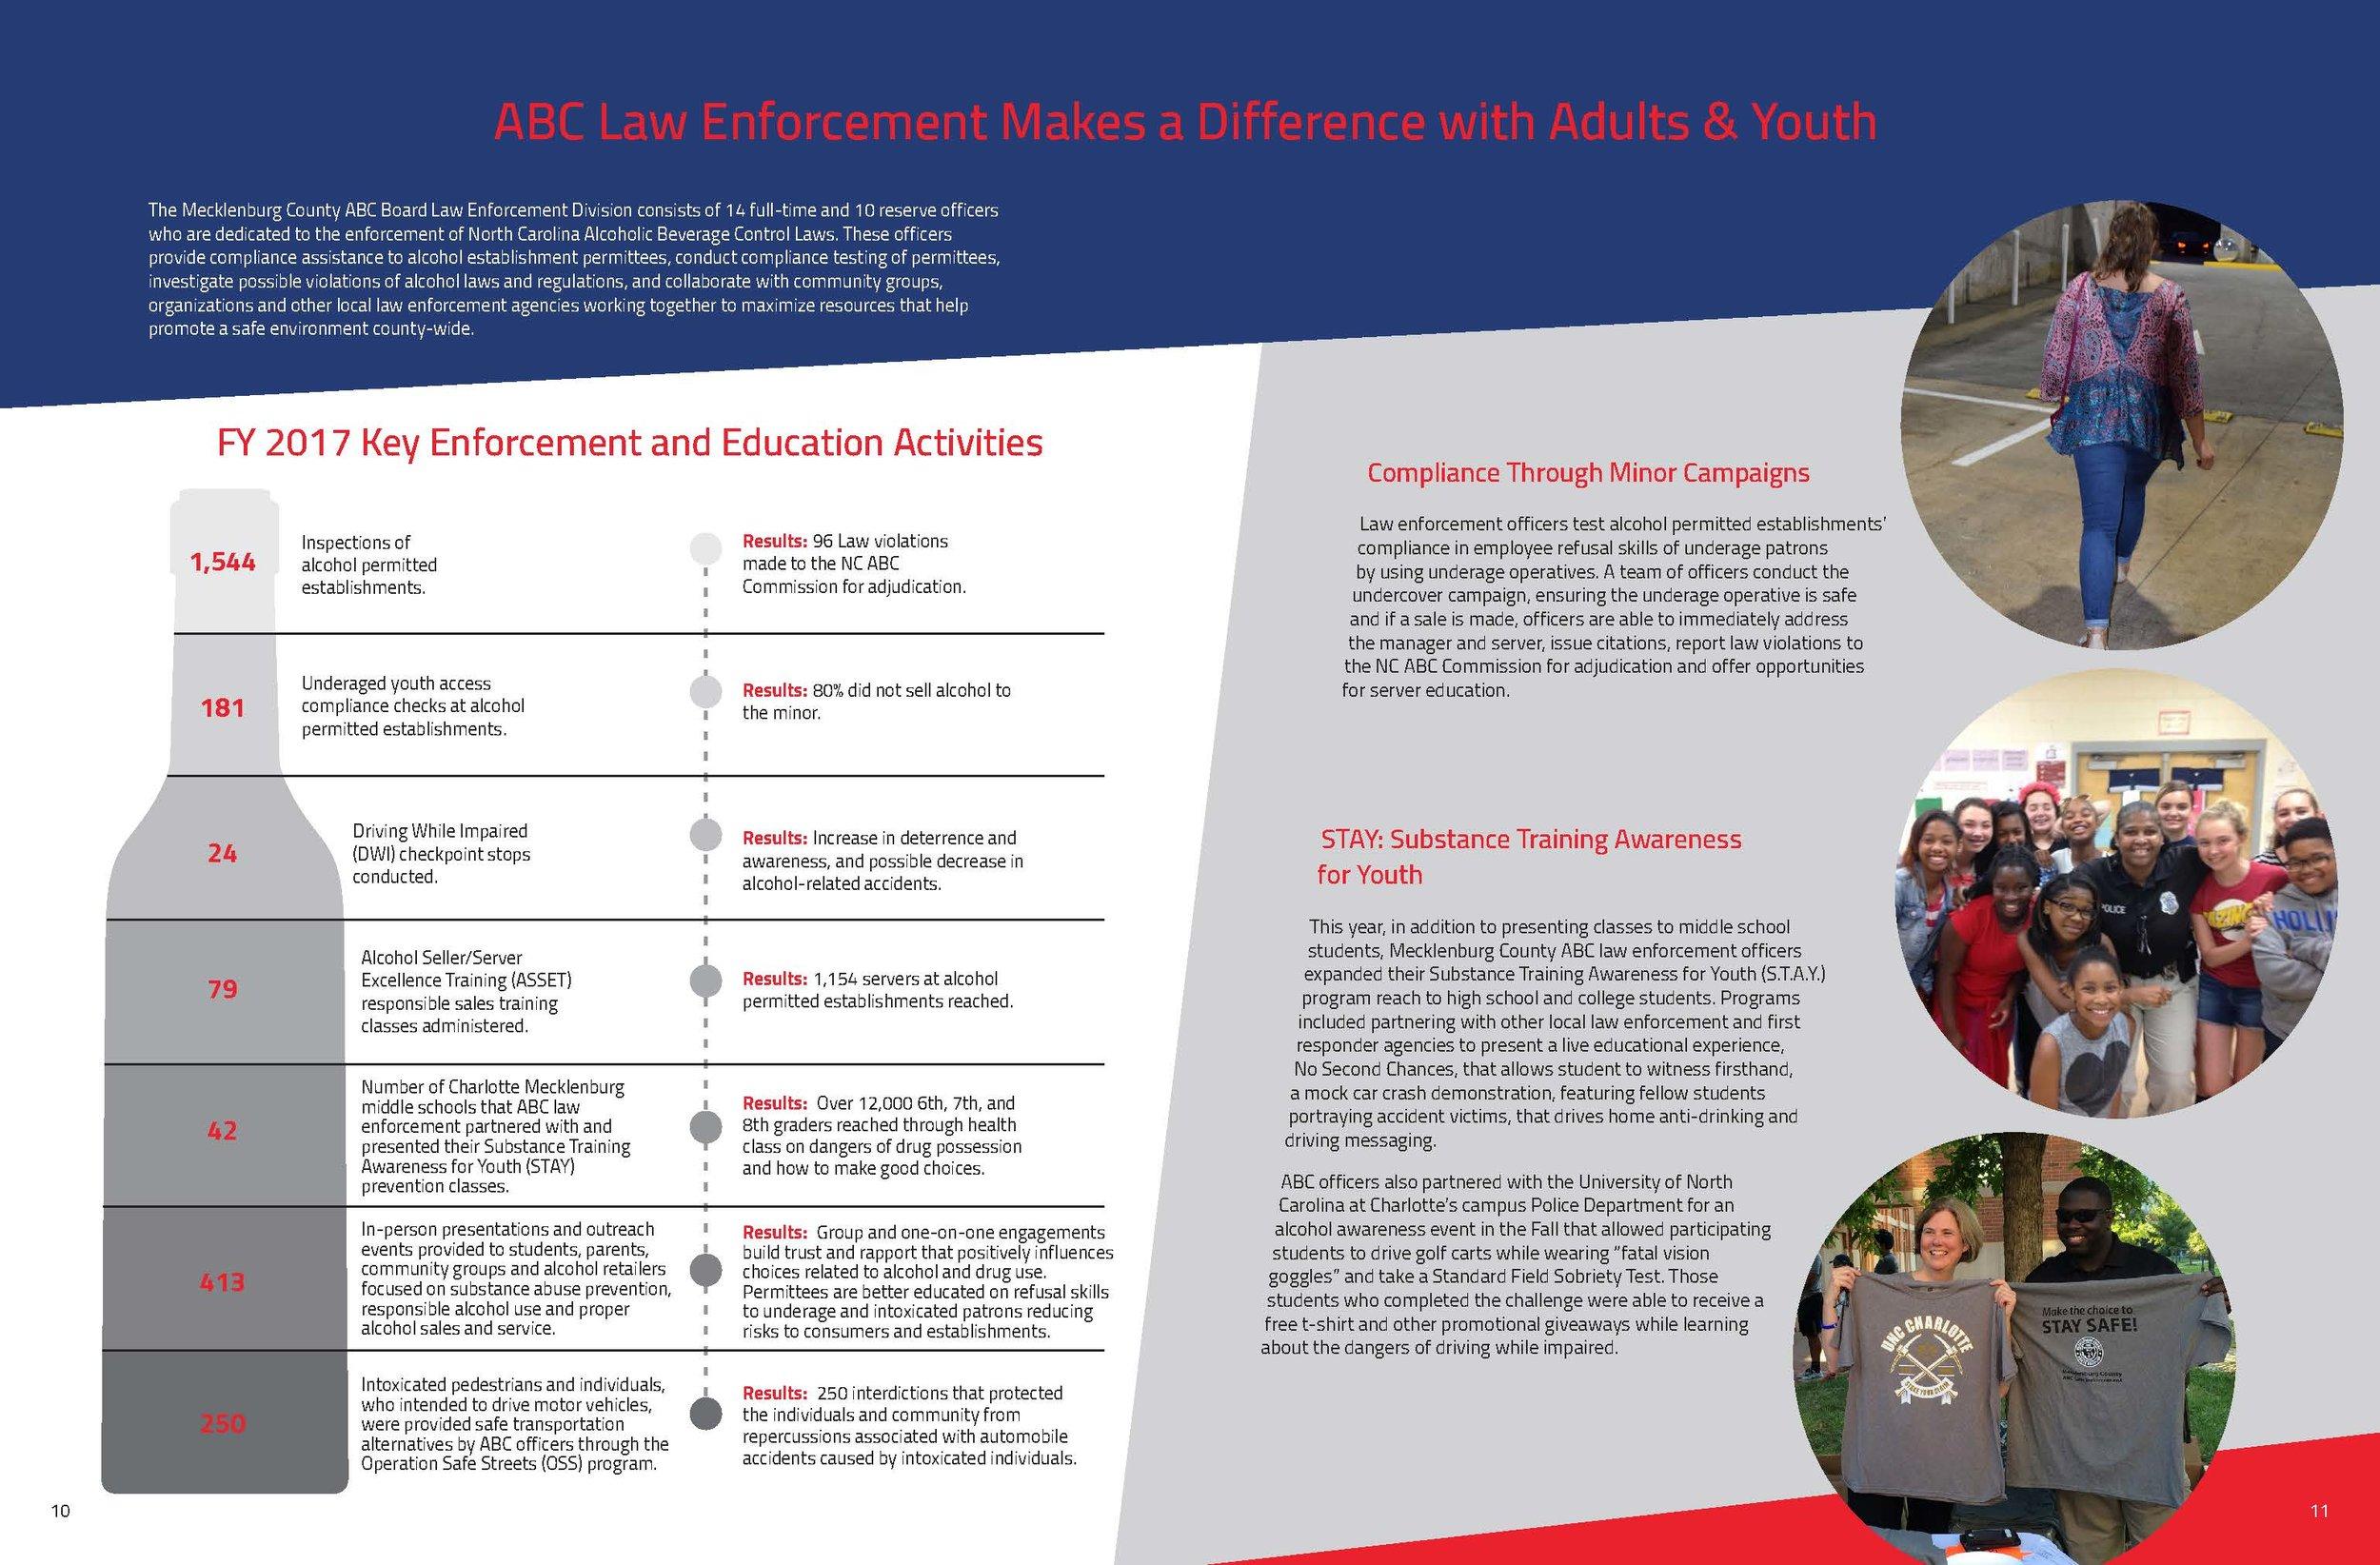 ABC_BOARD_ANNUAL_REPORT_November20C_MDC website_Page_6.jpg